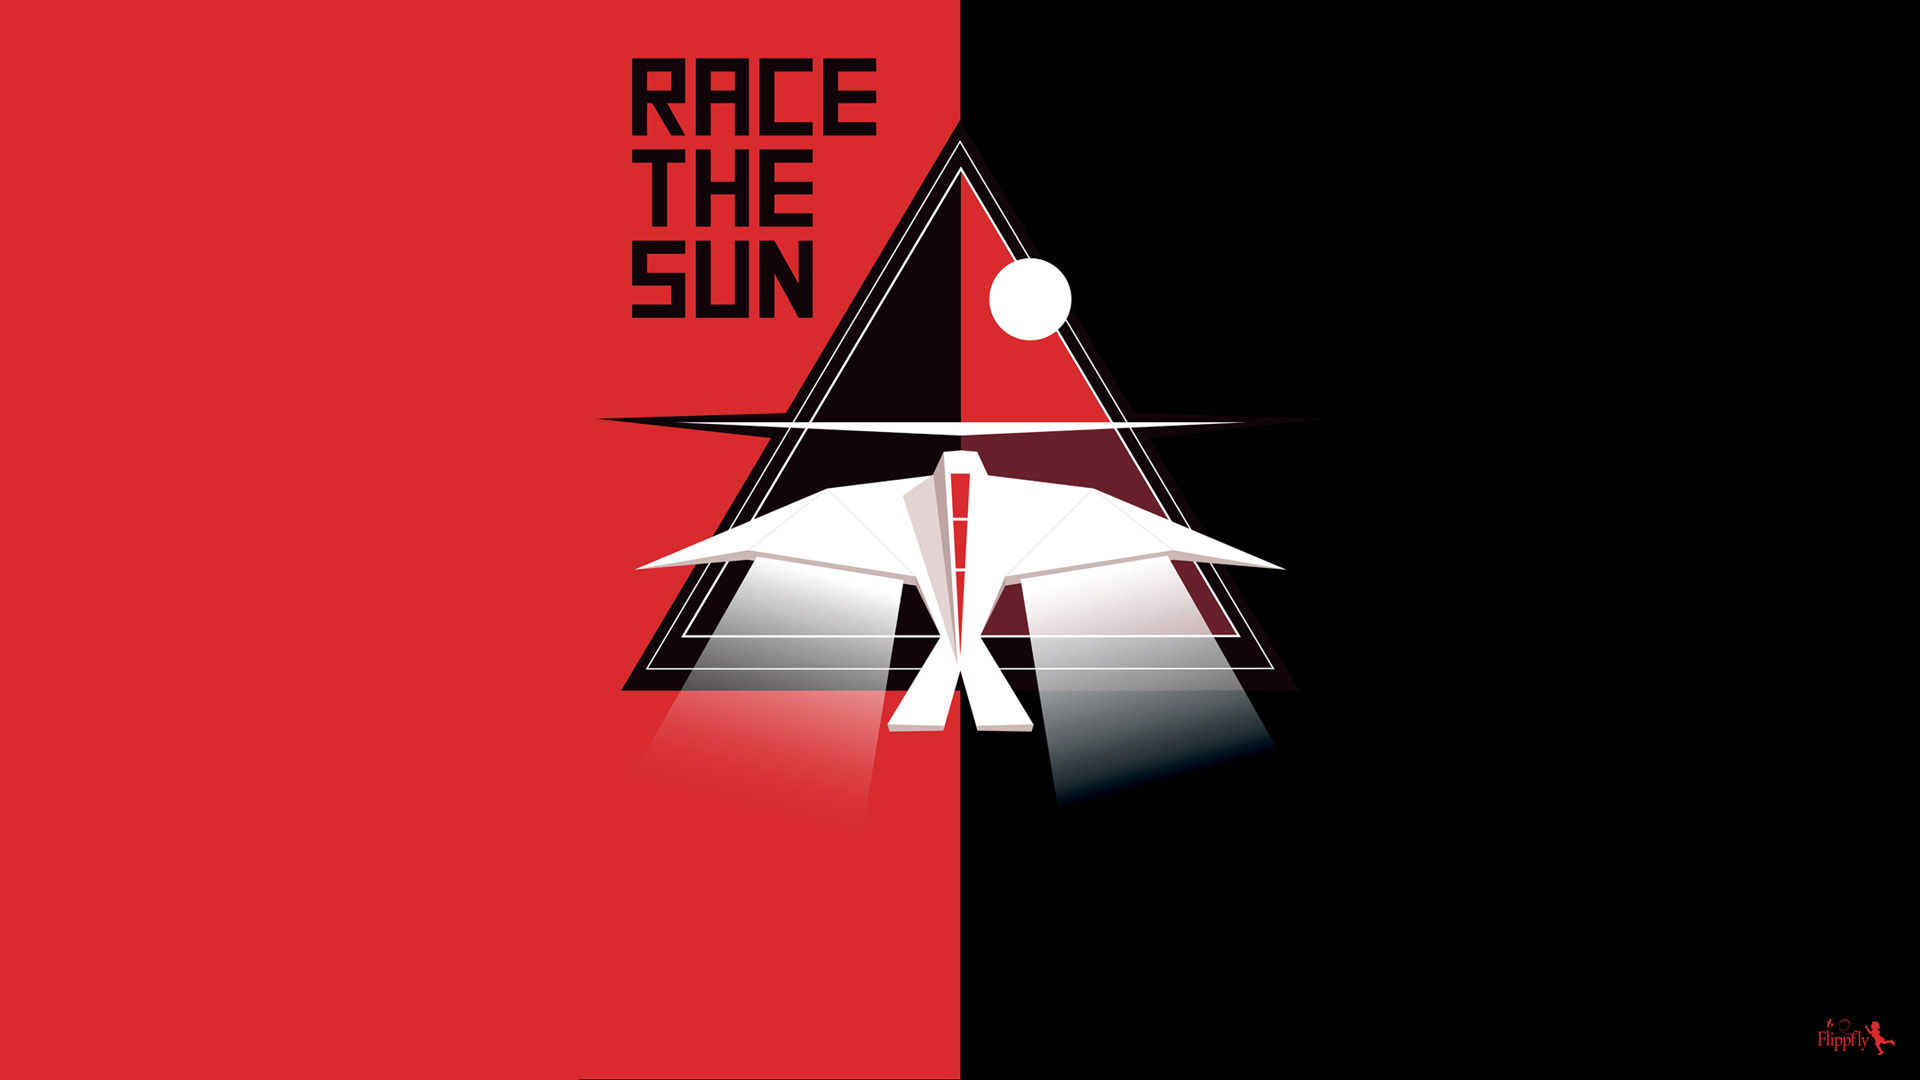 Race the Sun Wallpaper in 1920x1080